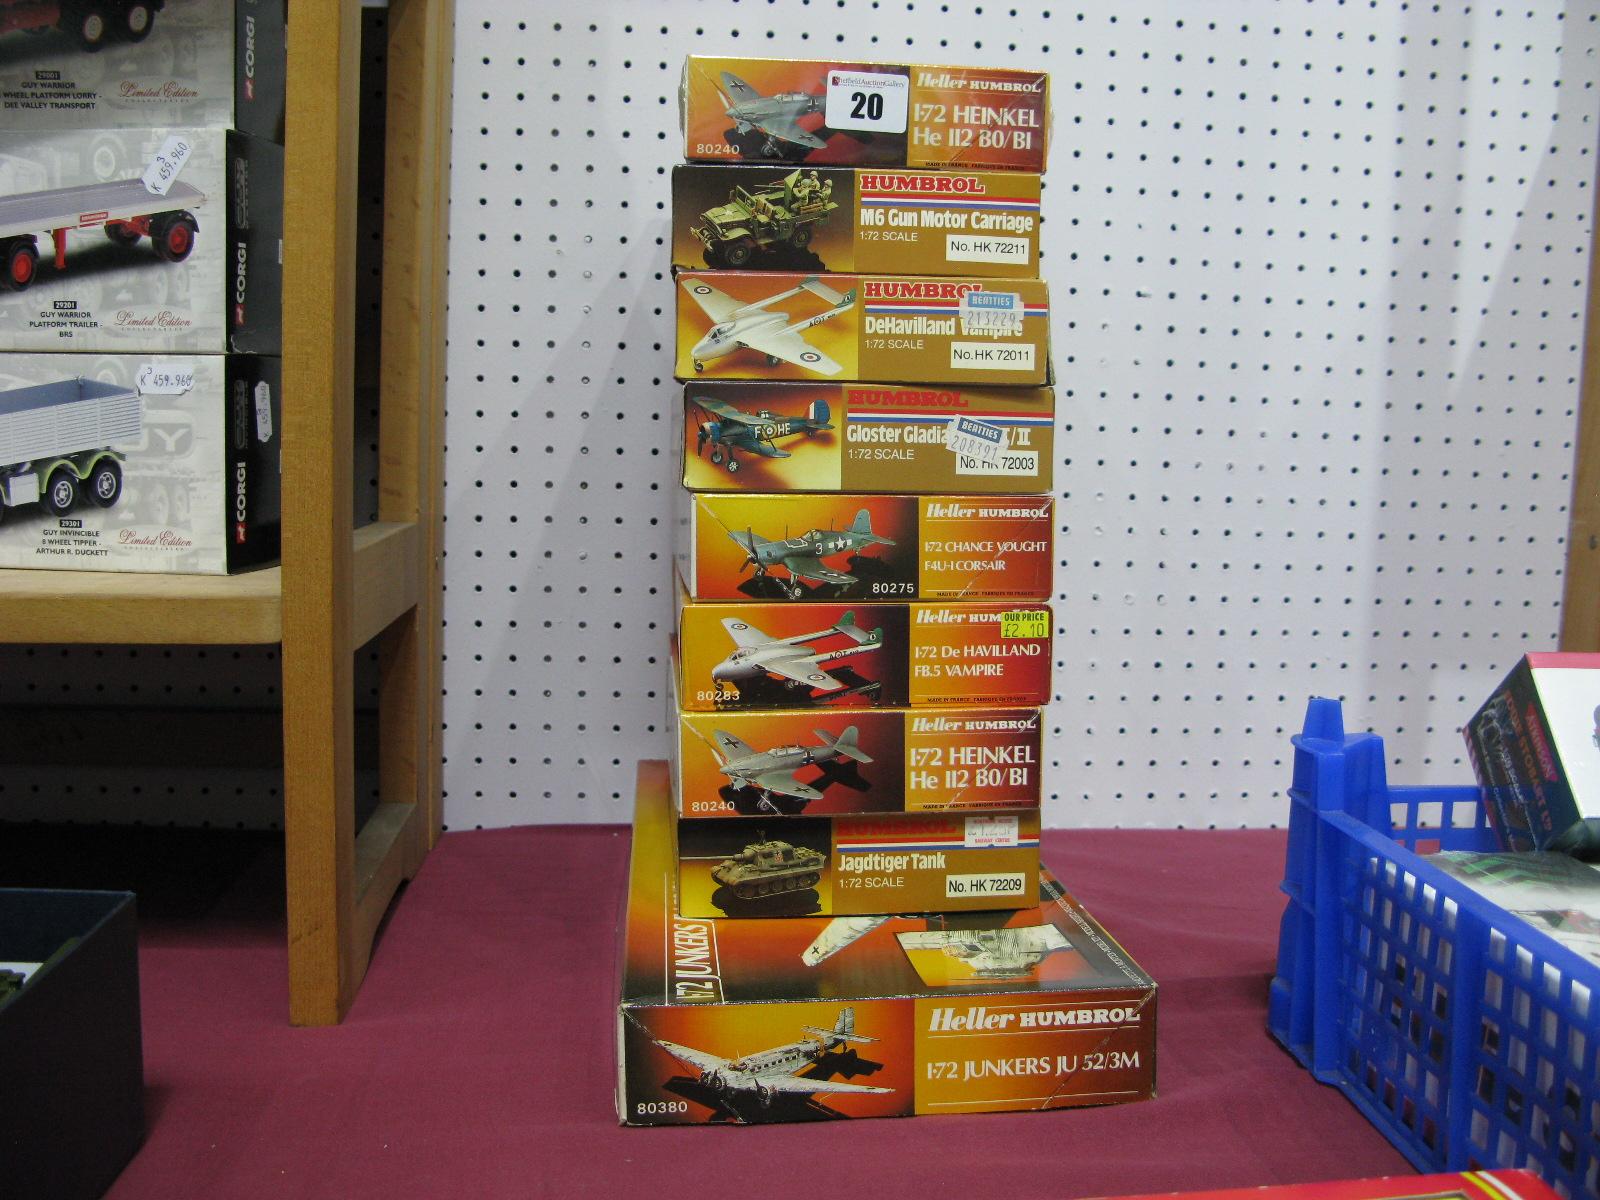 Lot 20 - Nine Boxed Humbrol, Heller Humbrol 1/72nd Scale Plastic Model Military Aircraft, vehicles kits